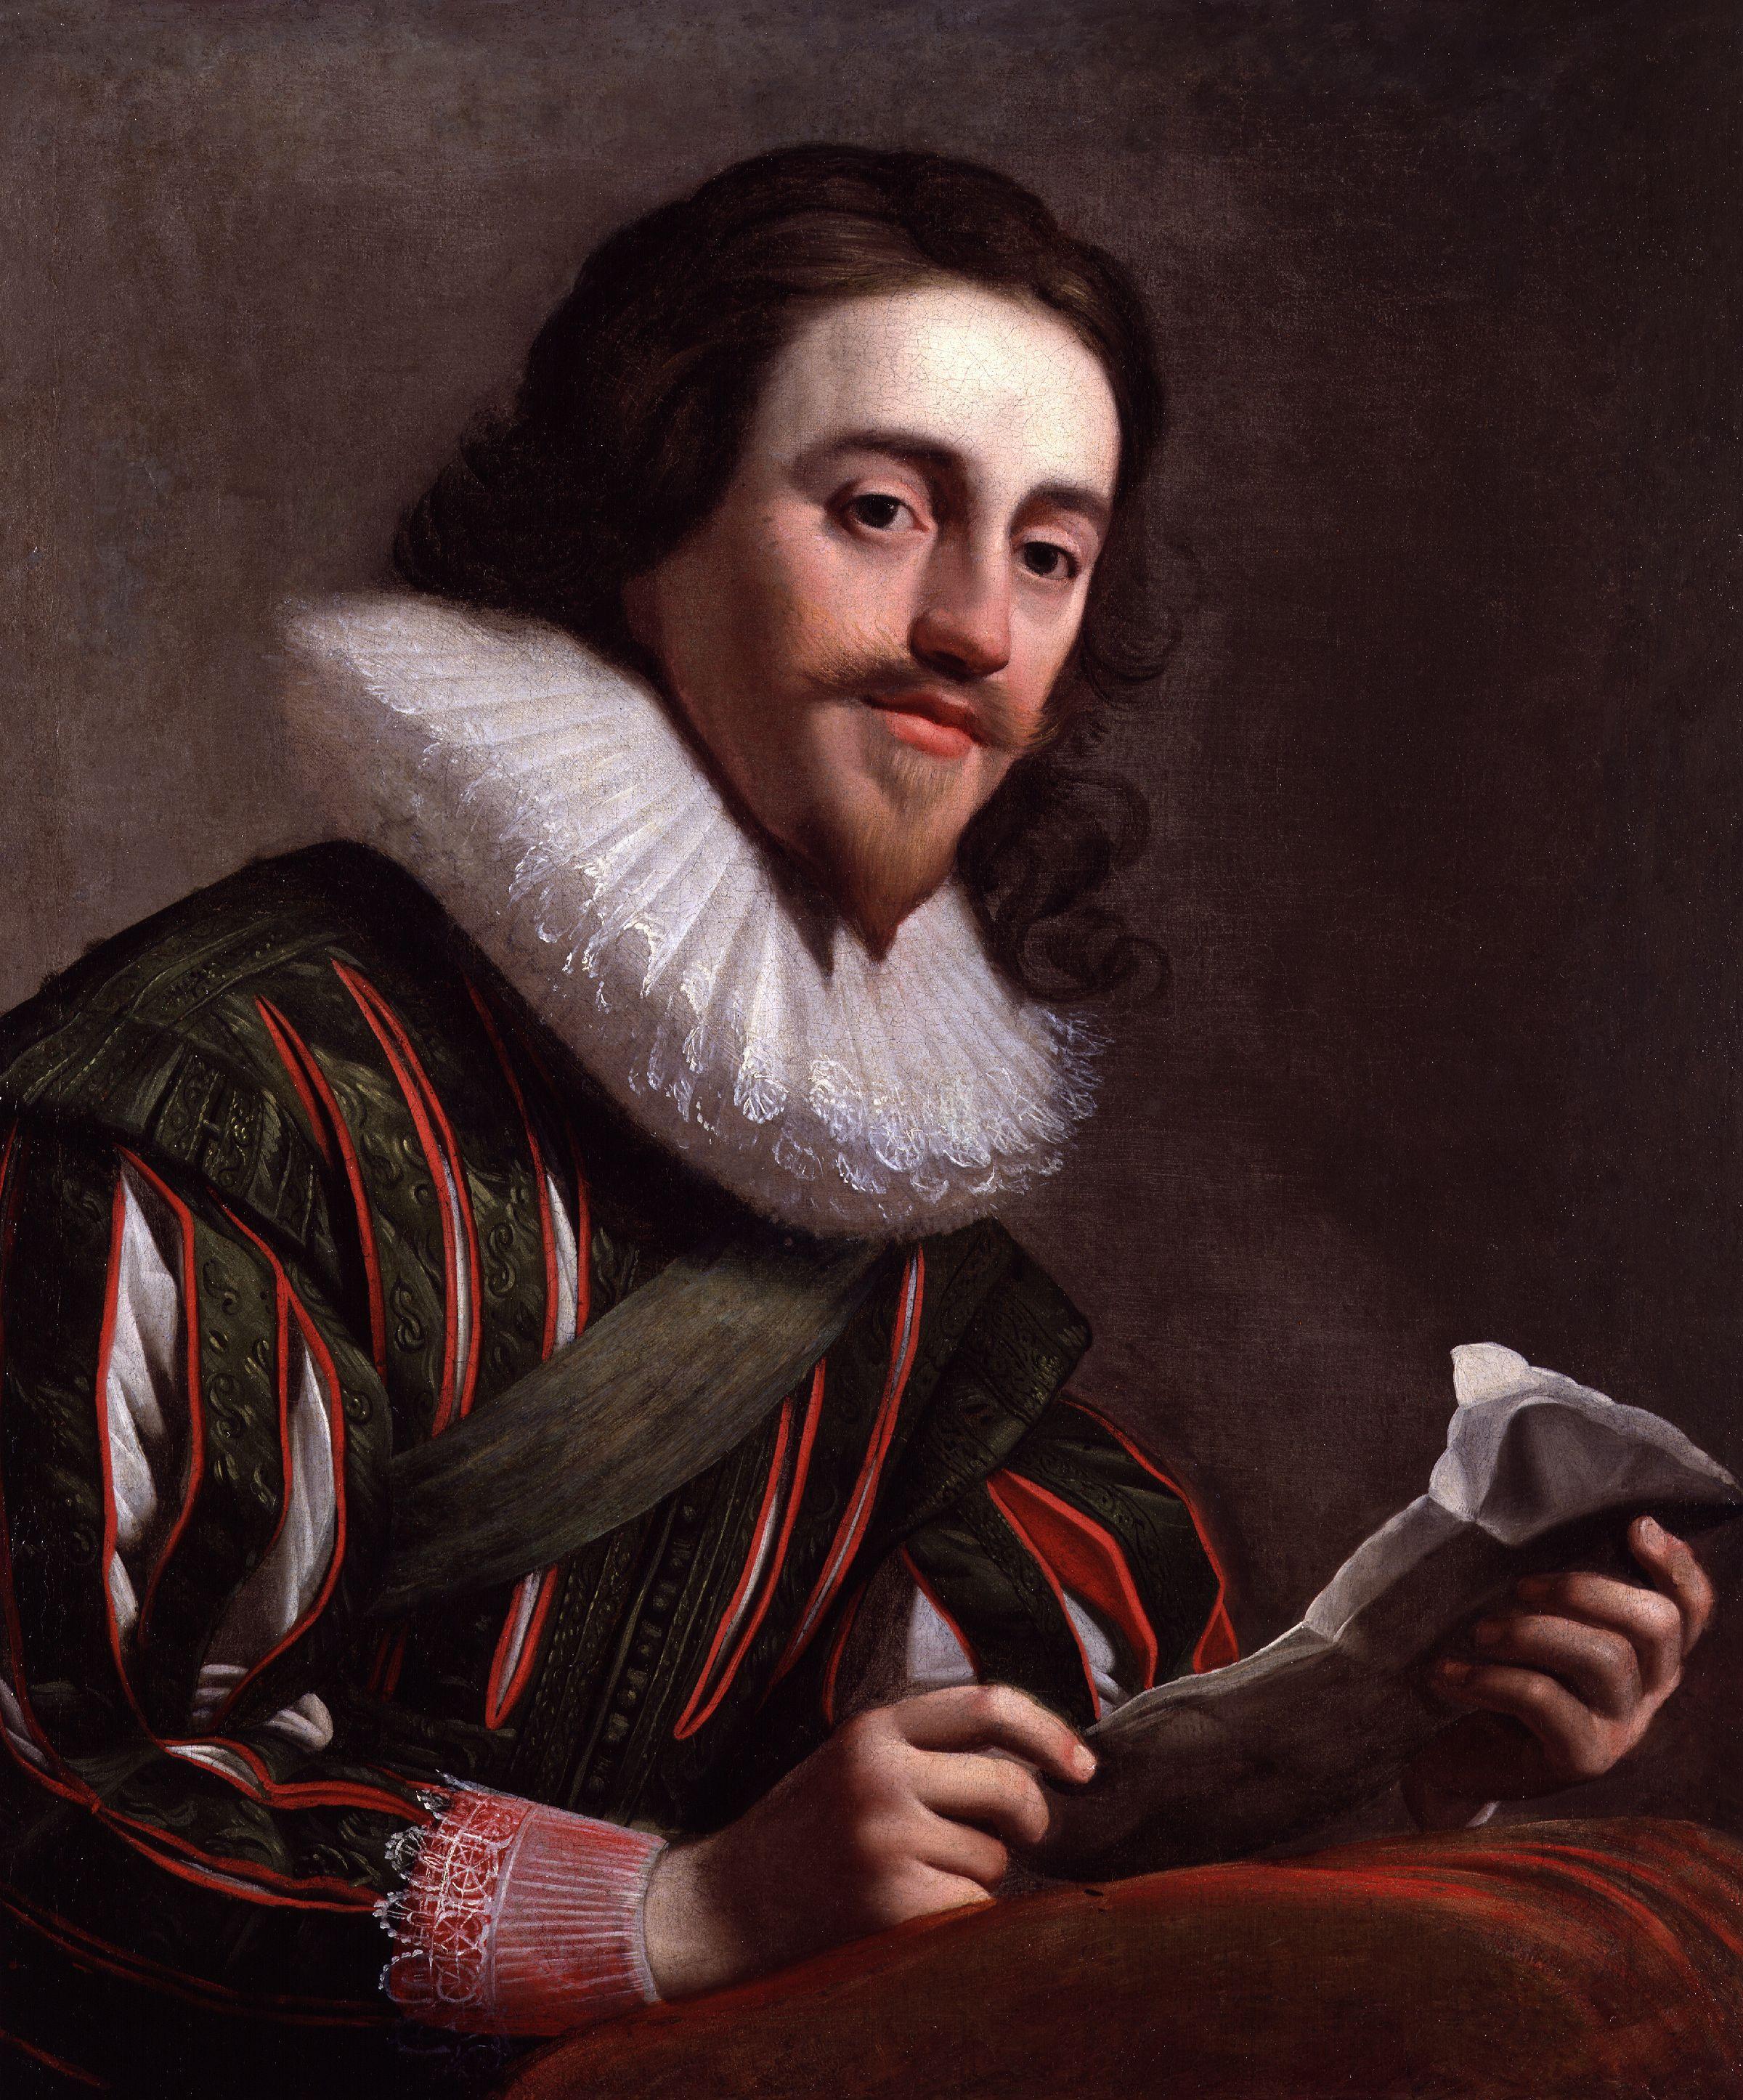 https://upload.wikimedia.org/wikipedia/commons/c/ca/King_Charles_I_by_Gerrit_van_Honthorst.jpg